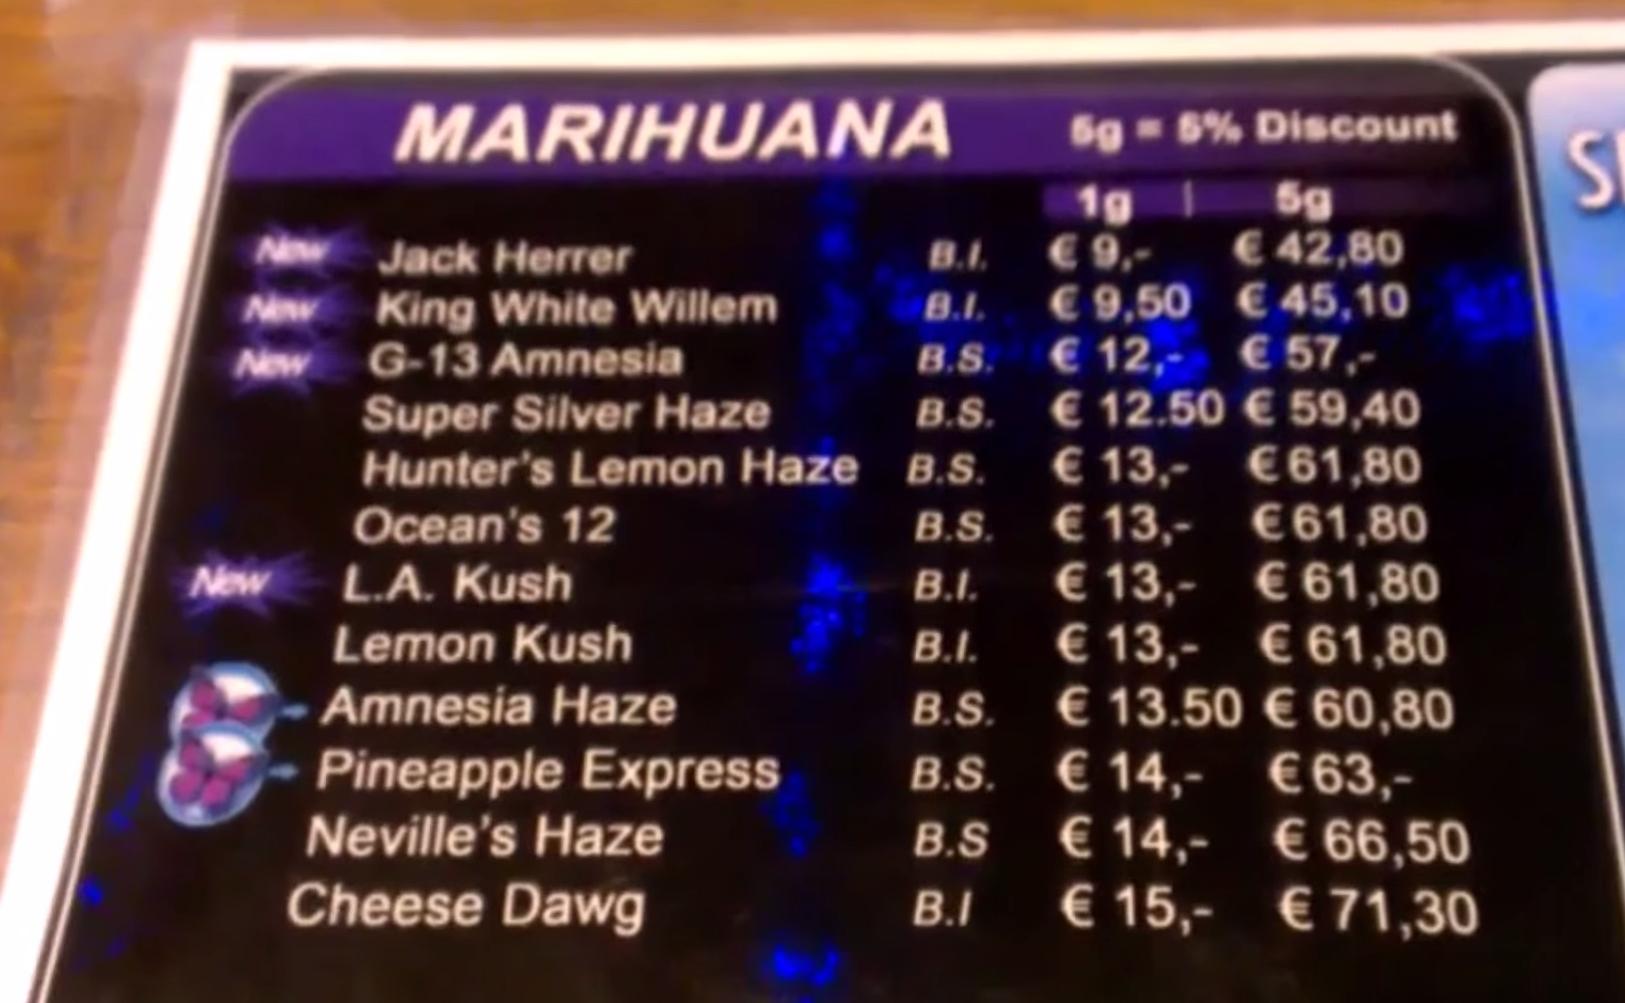 coffeeshop Sevilla Utrechtsestraat 14 menu june 2015 – Budhaze's ...: https://budhaze.wordpress.com/2014/09/26/coffeeshop-menus-amsterdam...